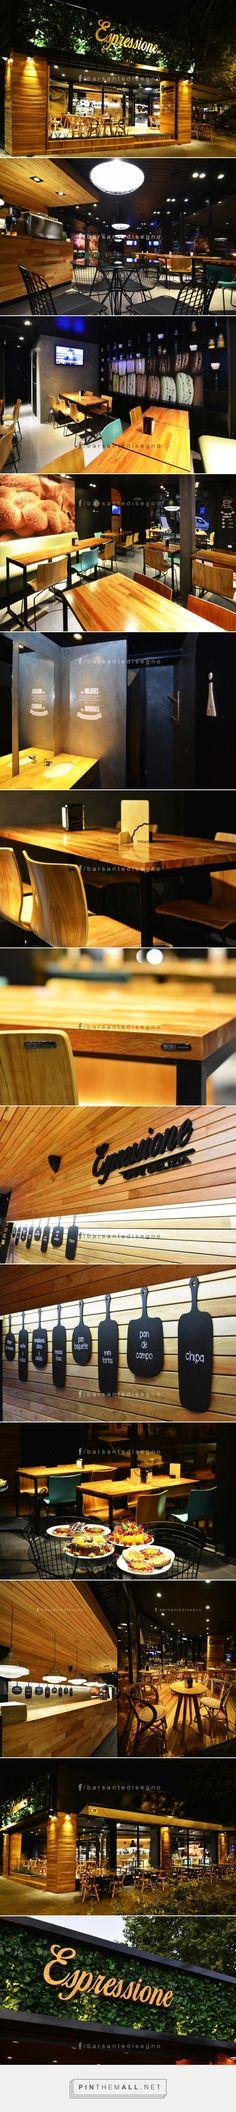 Espressione café delizia by Barsante Disegno, Rosario – Argentina --- http://retaildesignblog.net/